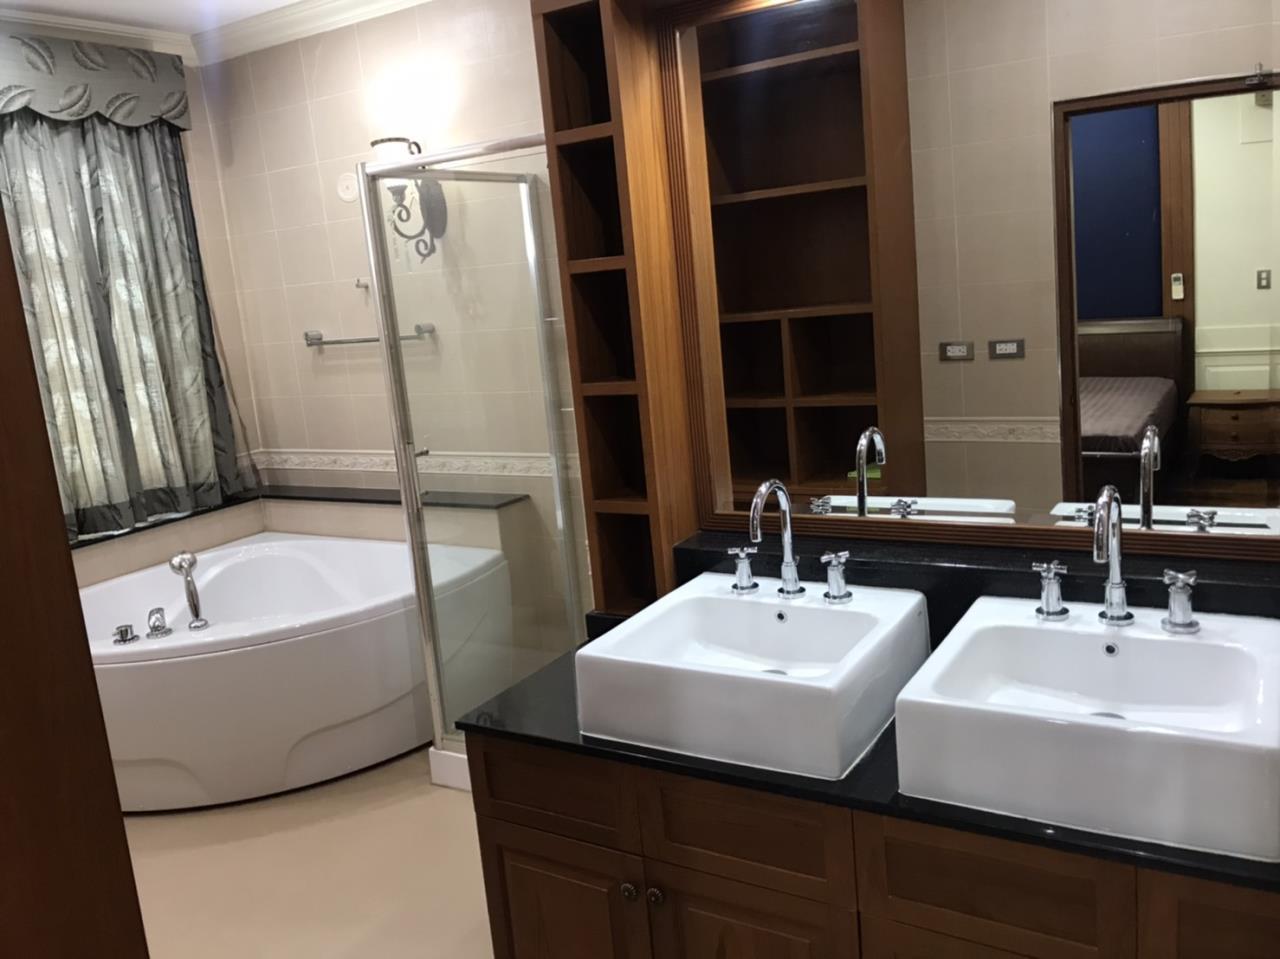 Blueocean property Agency's Condo For Rent – Condo Citismart Sukhumvit 18 11